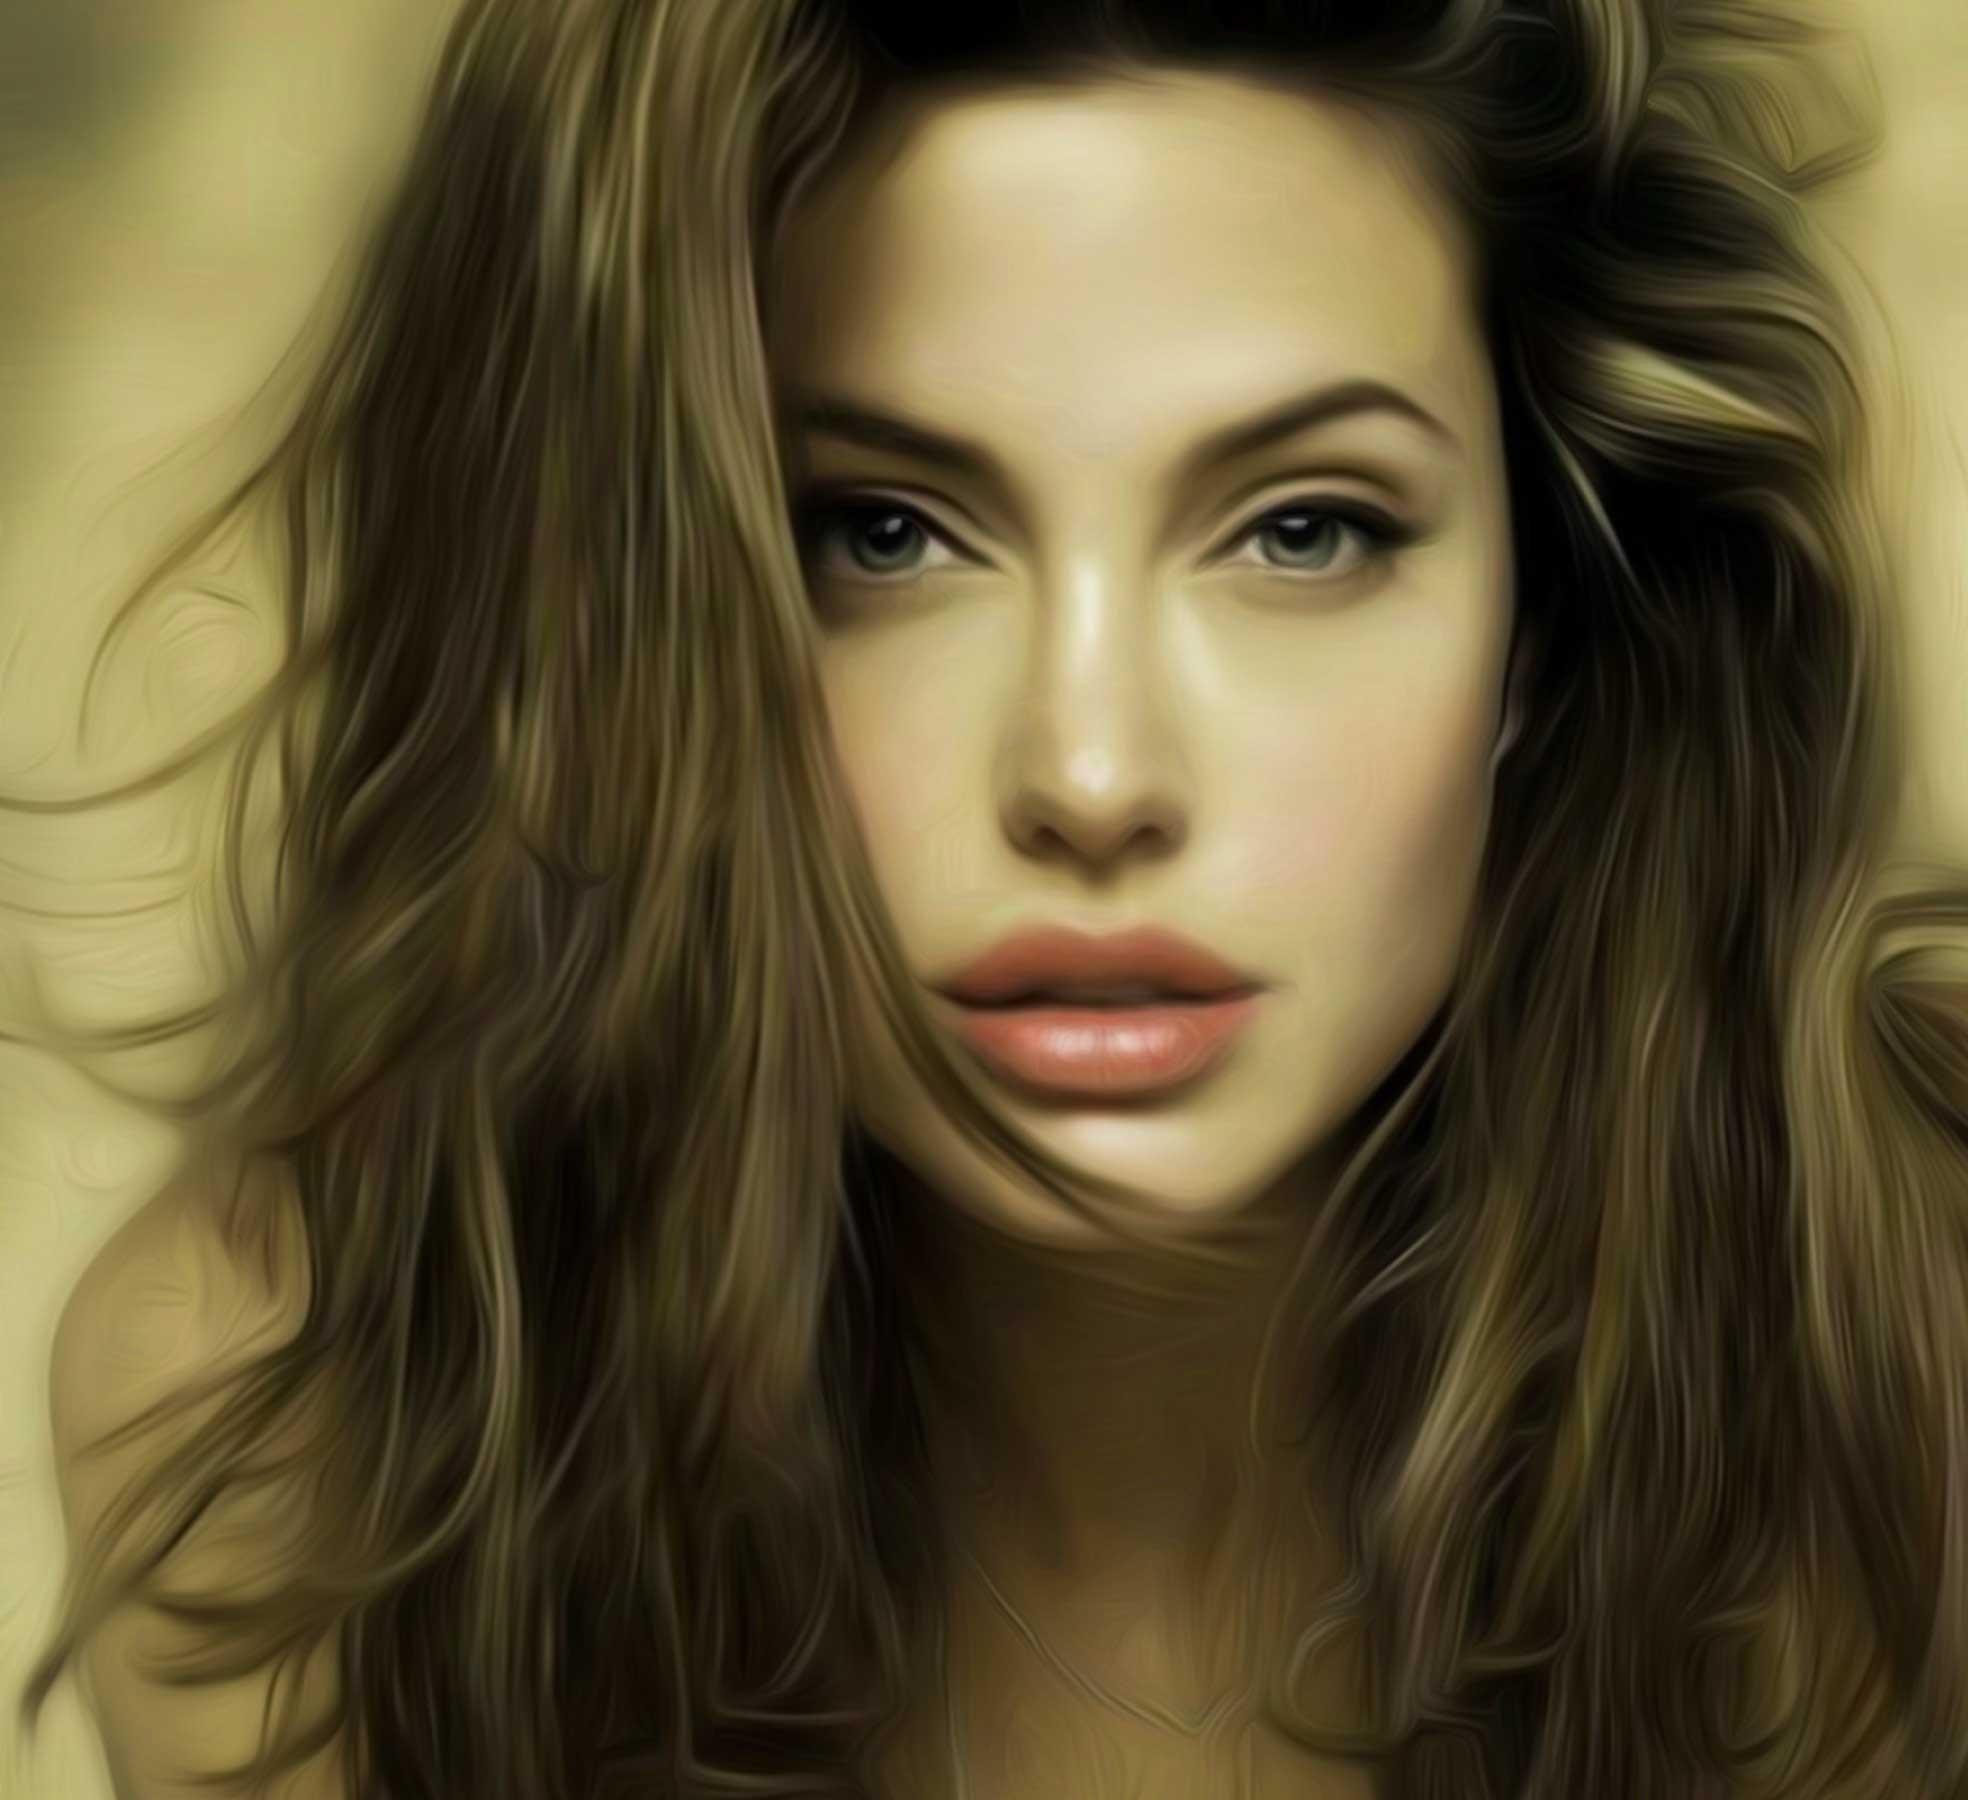 Free very cute beautiful girl images Wallpaper Download